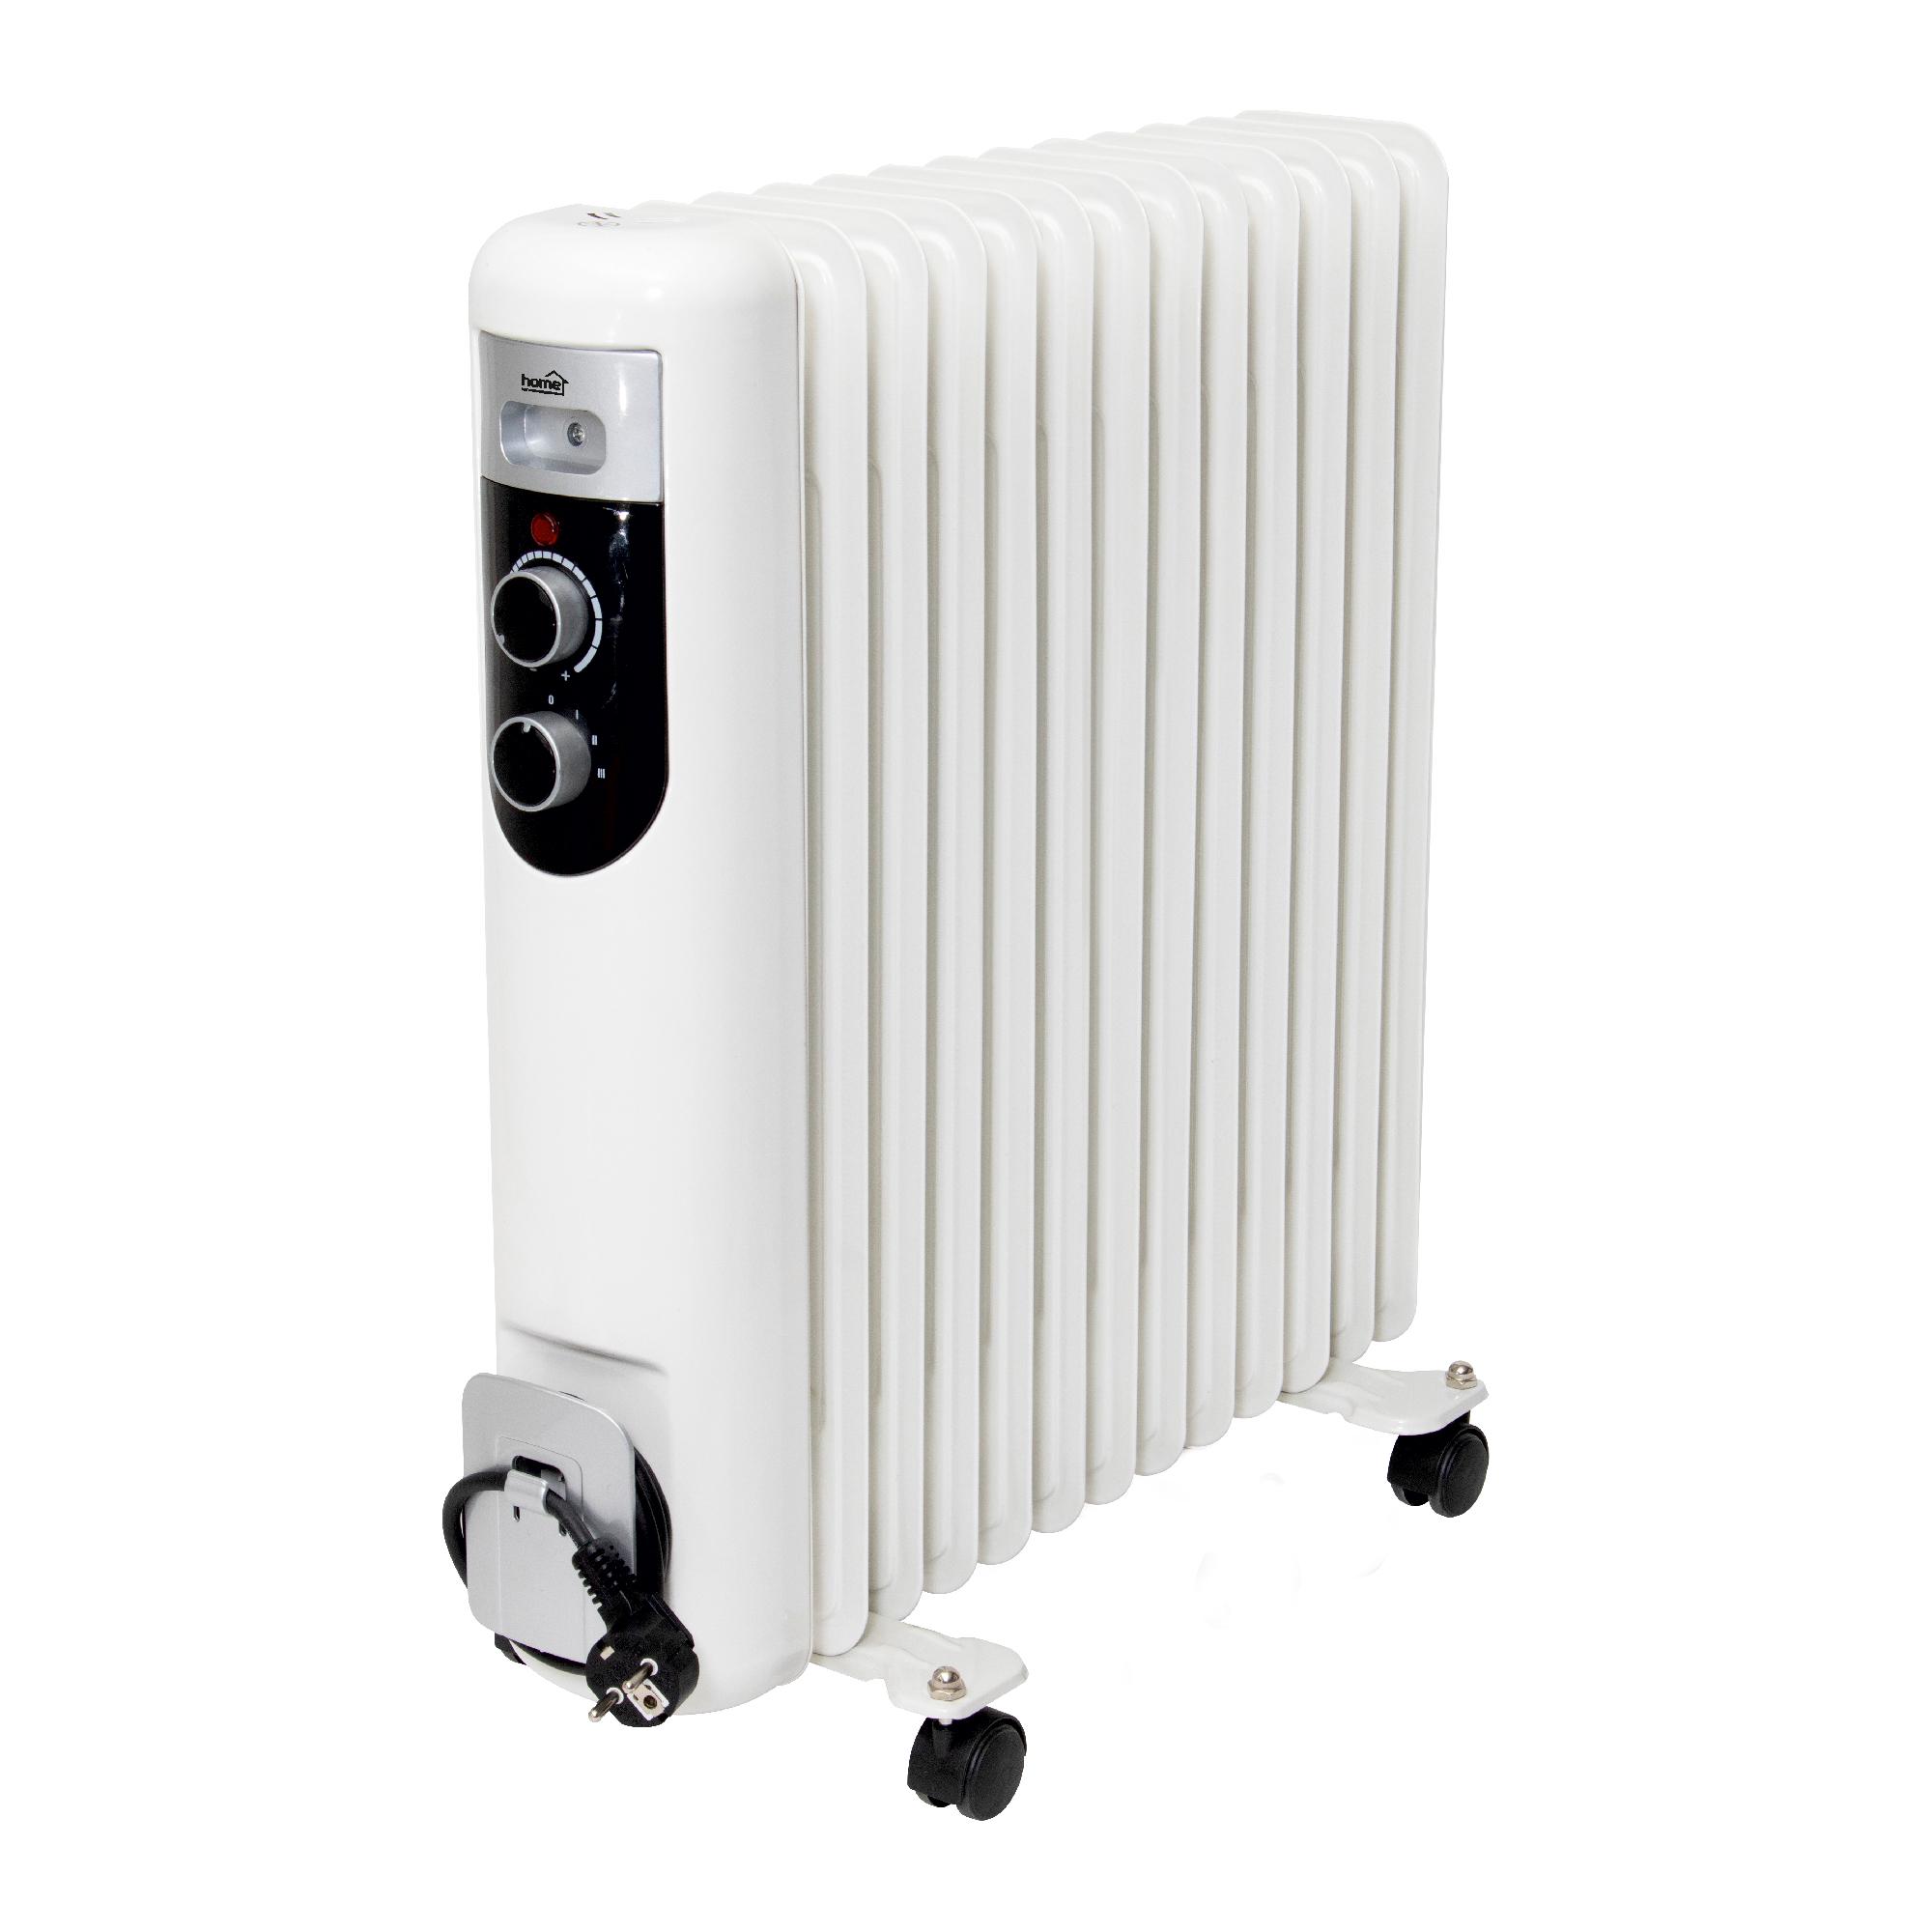 Calorifer electric cu ulei Home by somogyi FKOS 13M, 2 panouri convectoare, 2500W, aluminiu, alb, 60 x 58 cm imagine 2021 mathaus